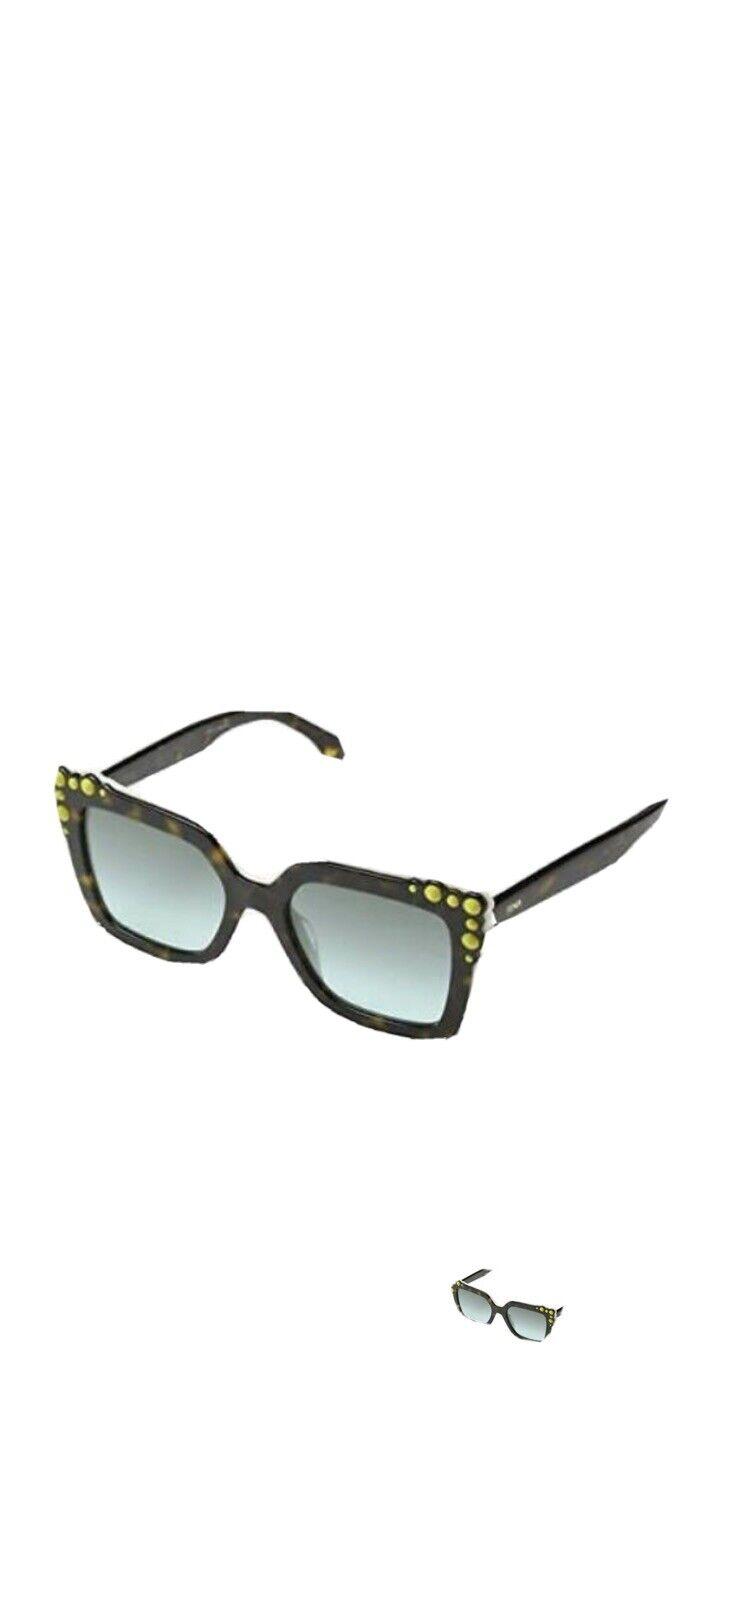 FENDI Sunglasses Havana Stones Women Classy